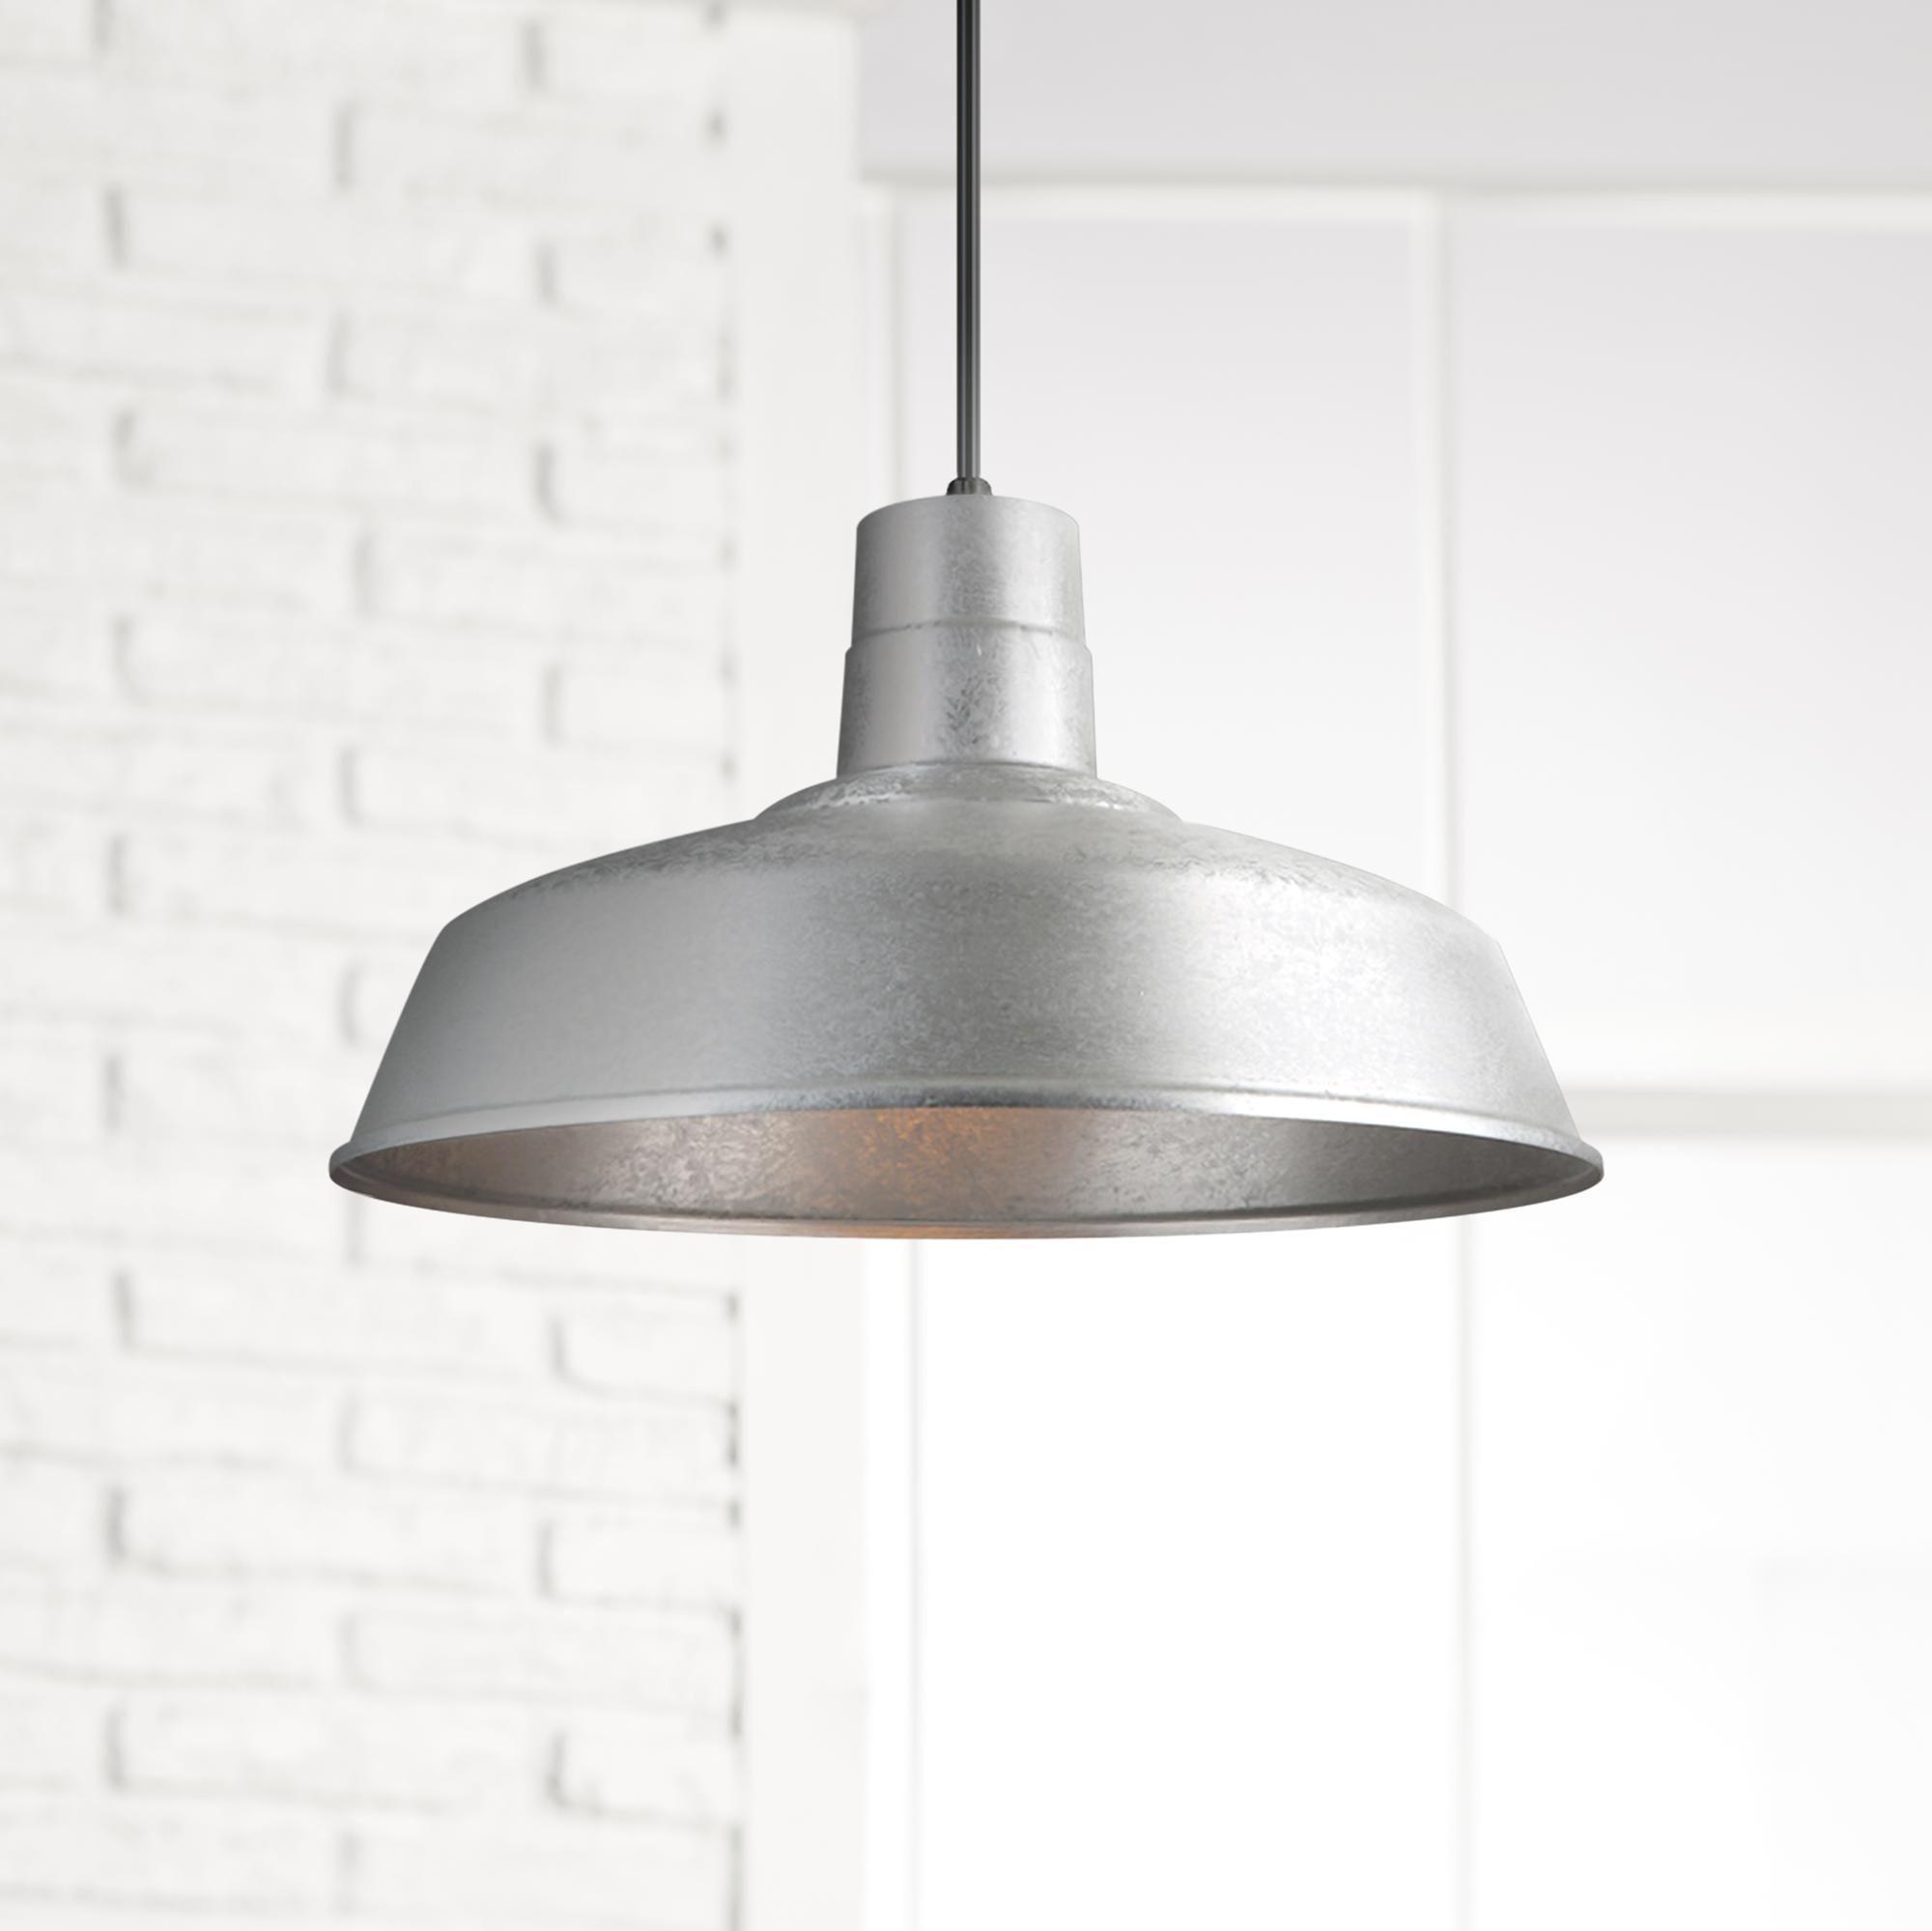 Pin On Lighting Fixtures